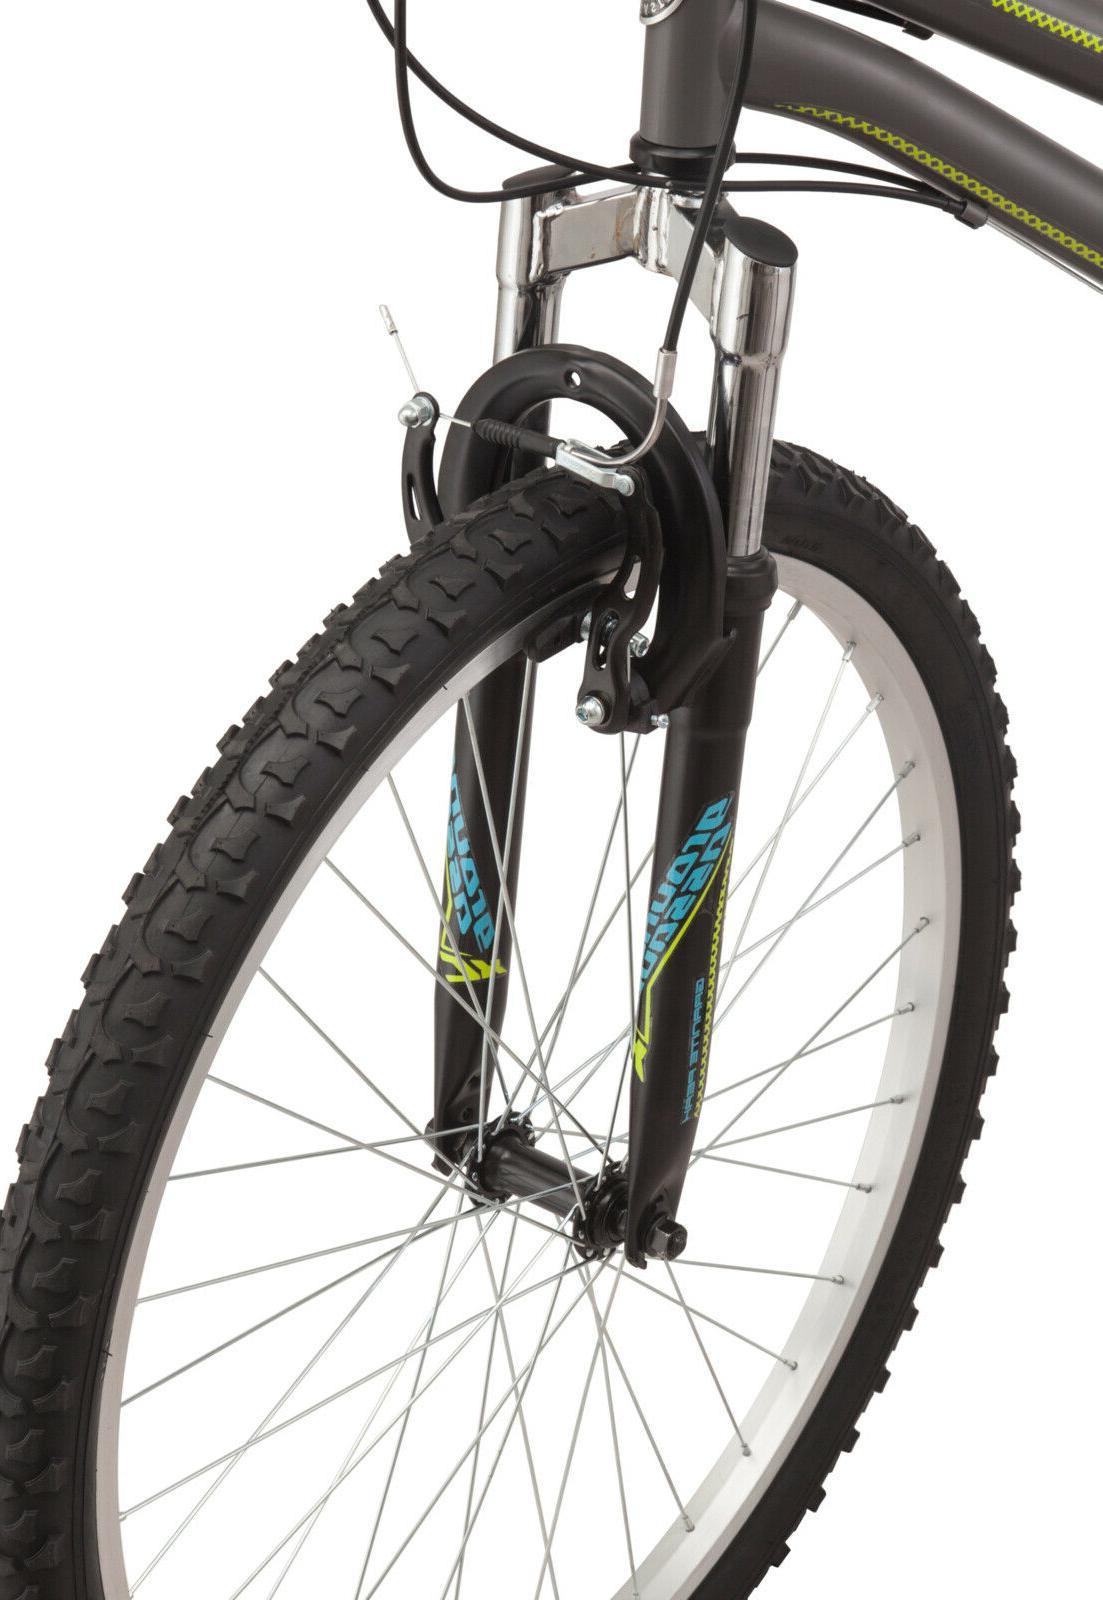 Roadmaster Granite Peak Mountain Bike, Black